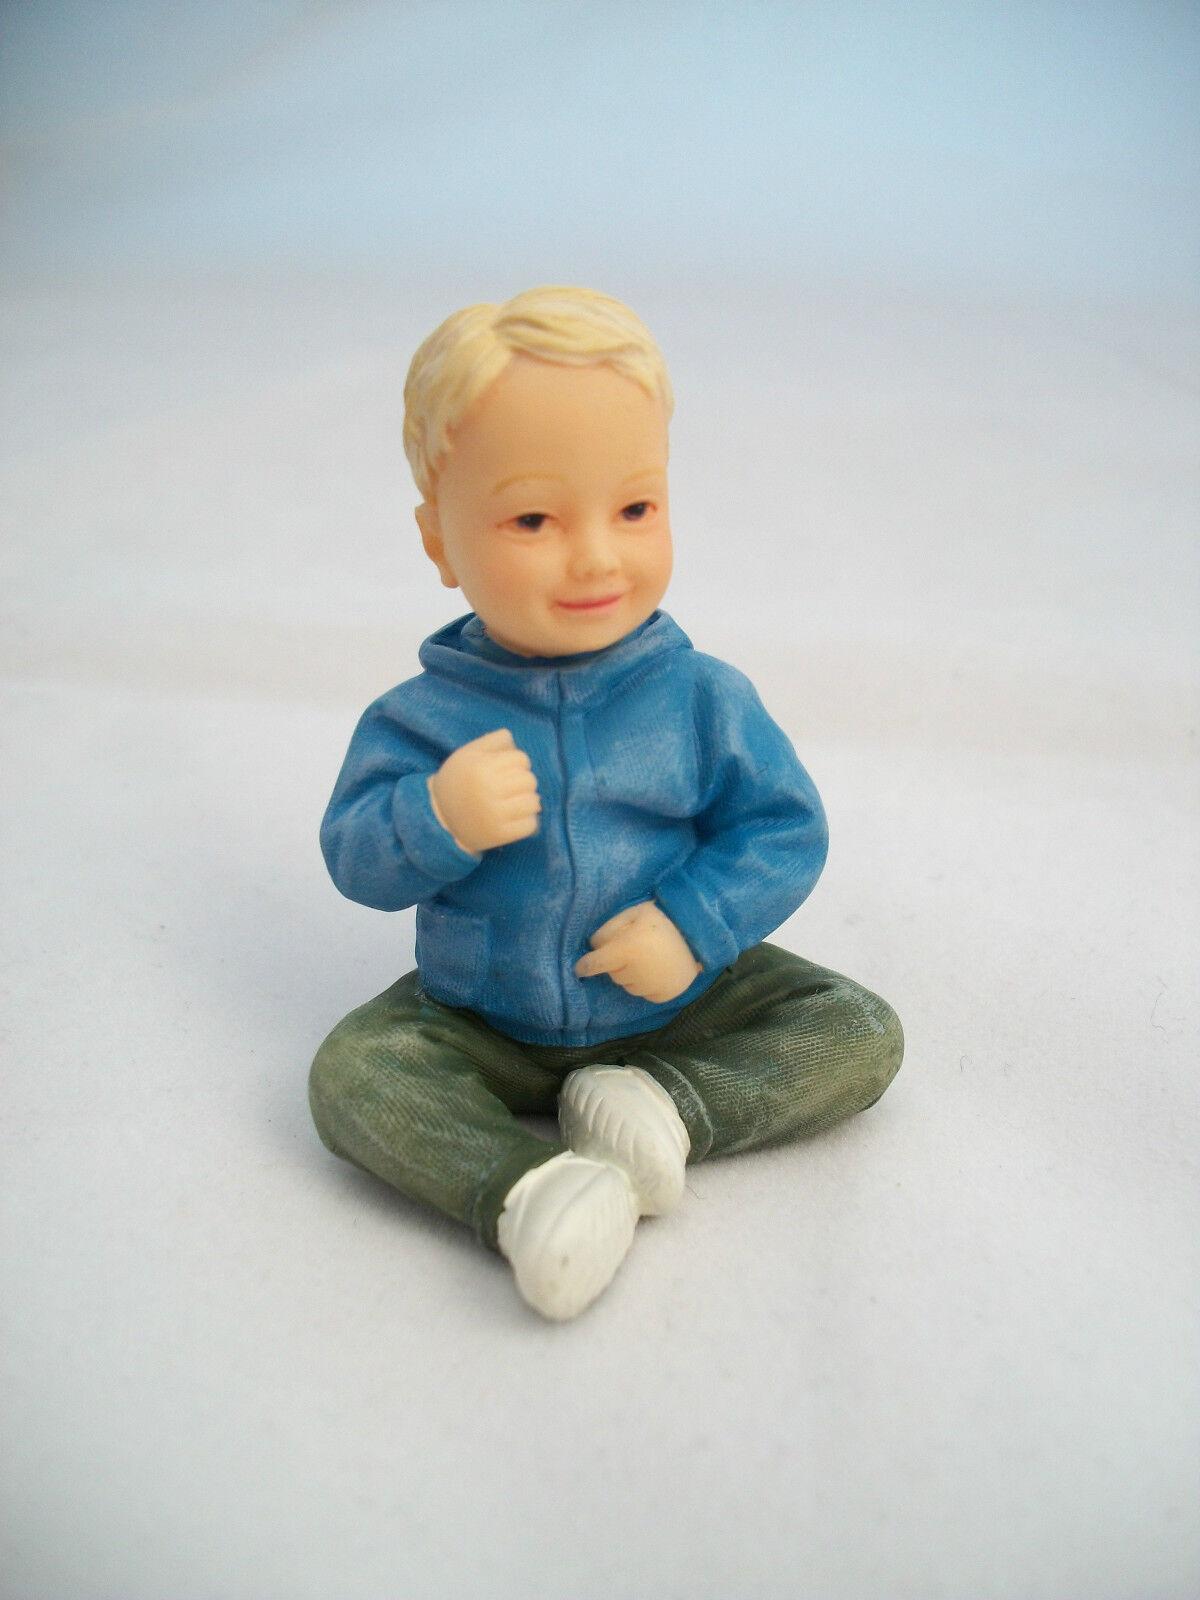 Resin Doll - Daniel (sitting Toddler Boy) 3073 1/12 Scale Houseworks